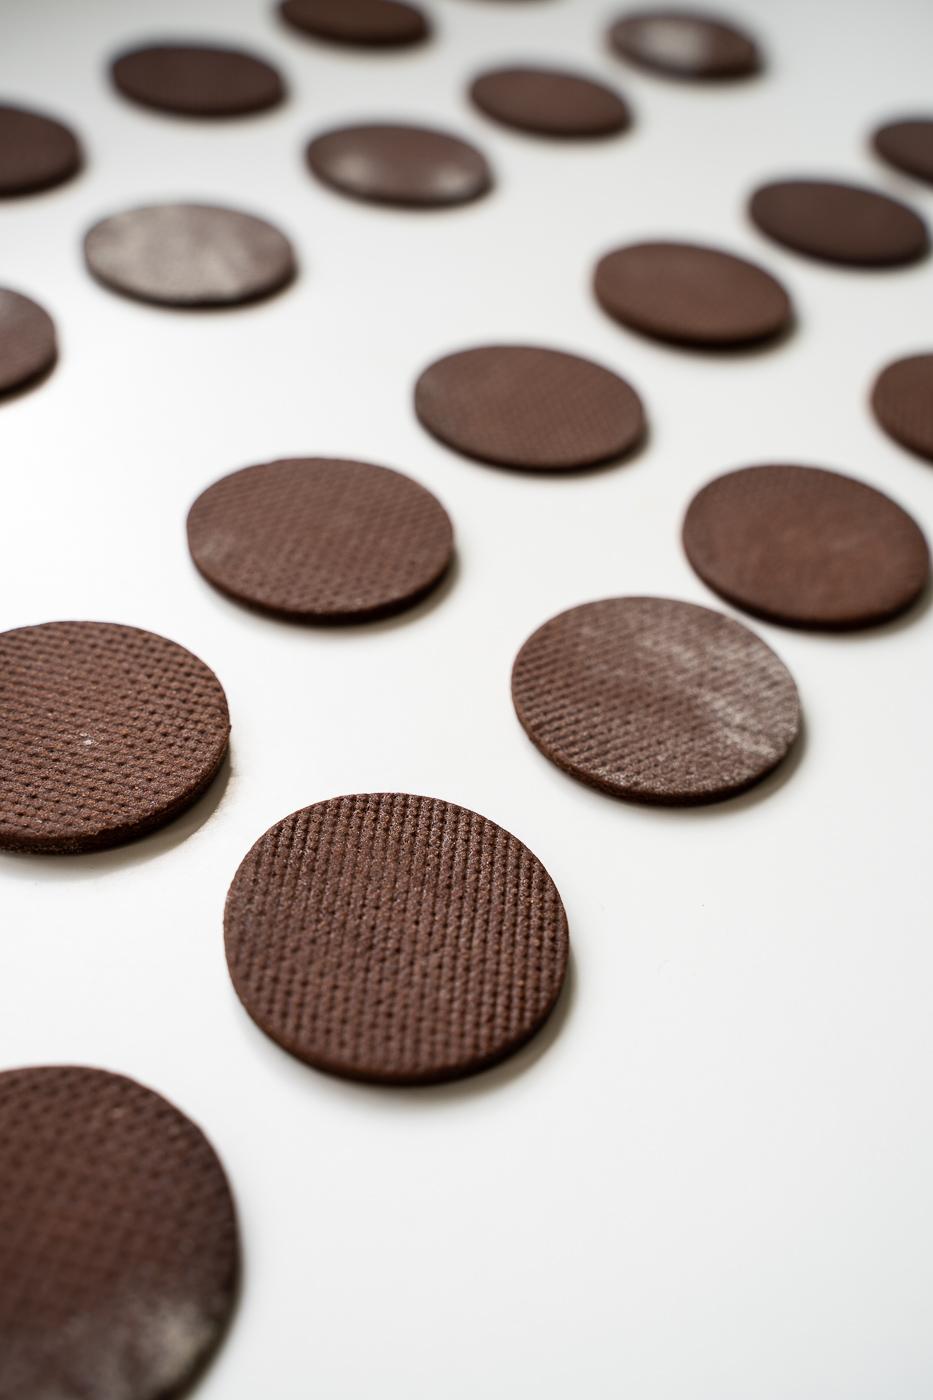 biscuits-fourres-chocolat-2.jpg